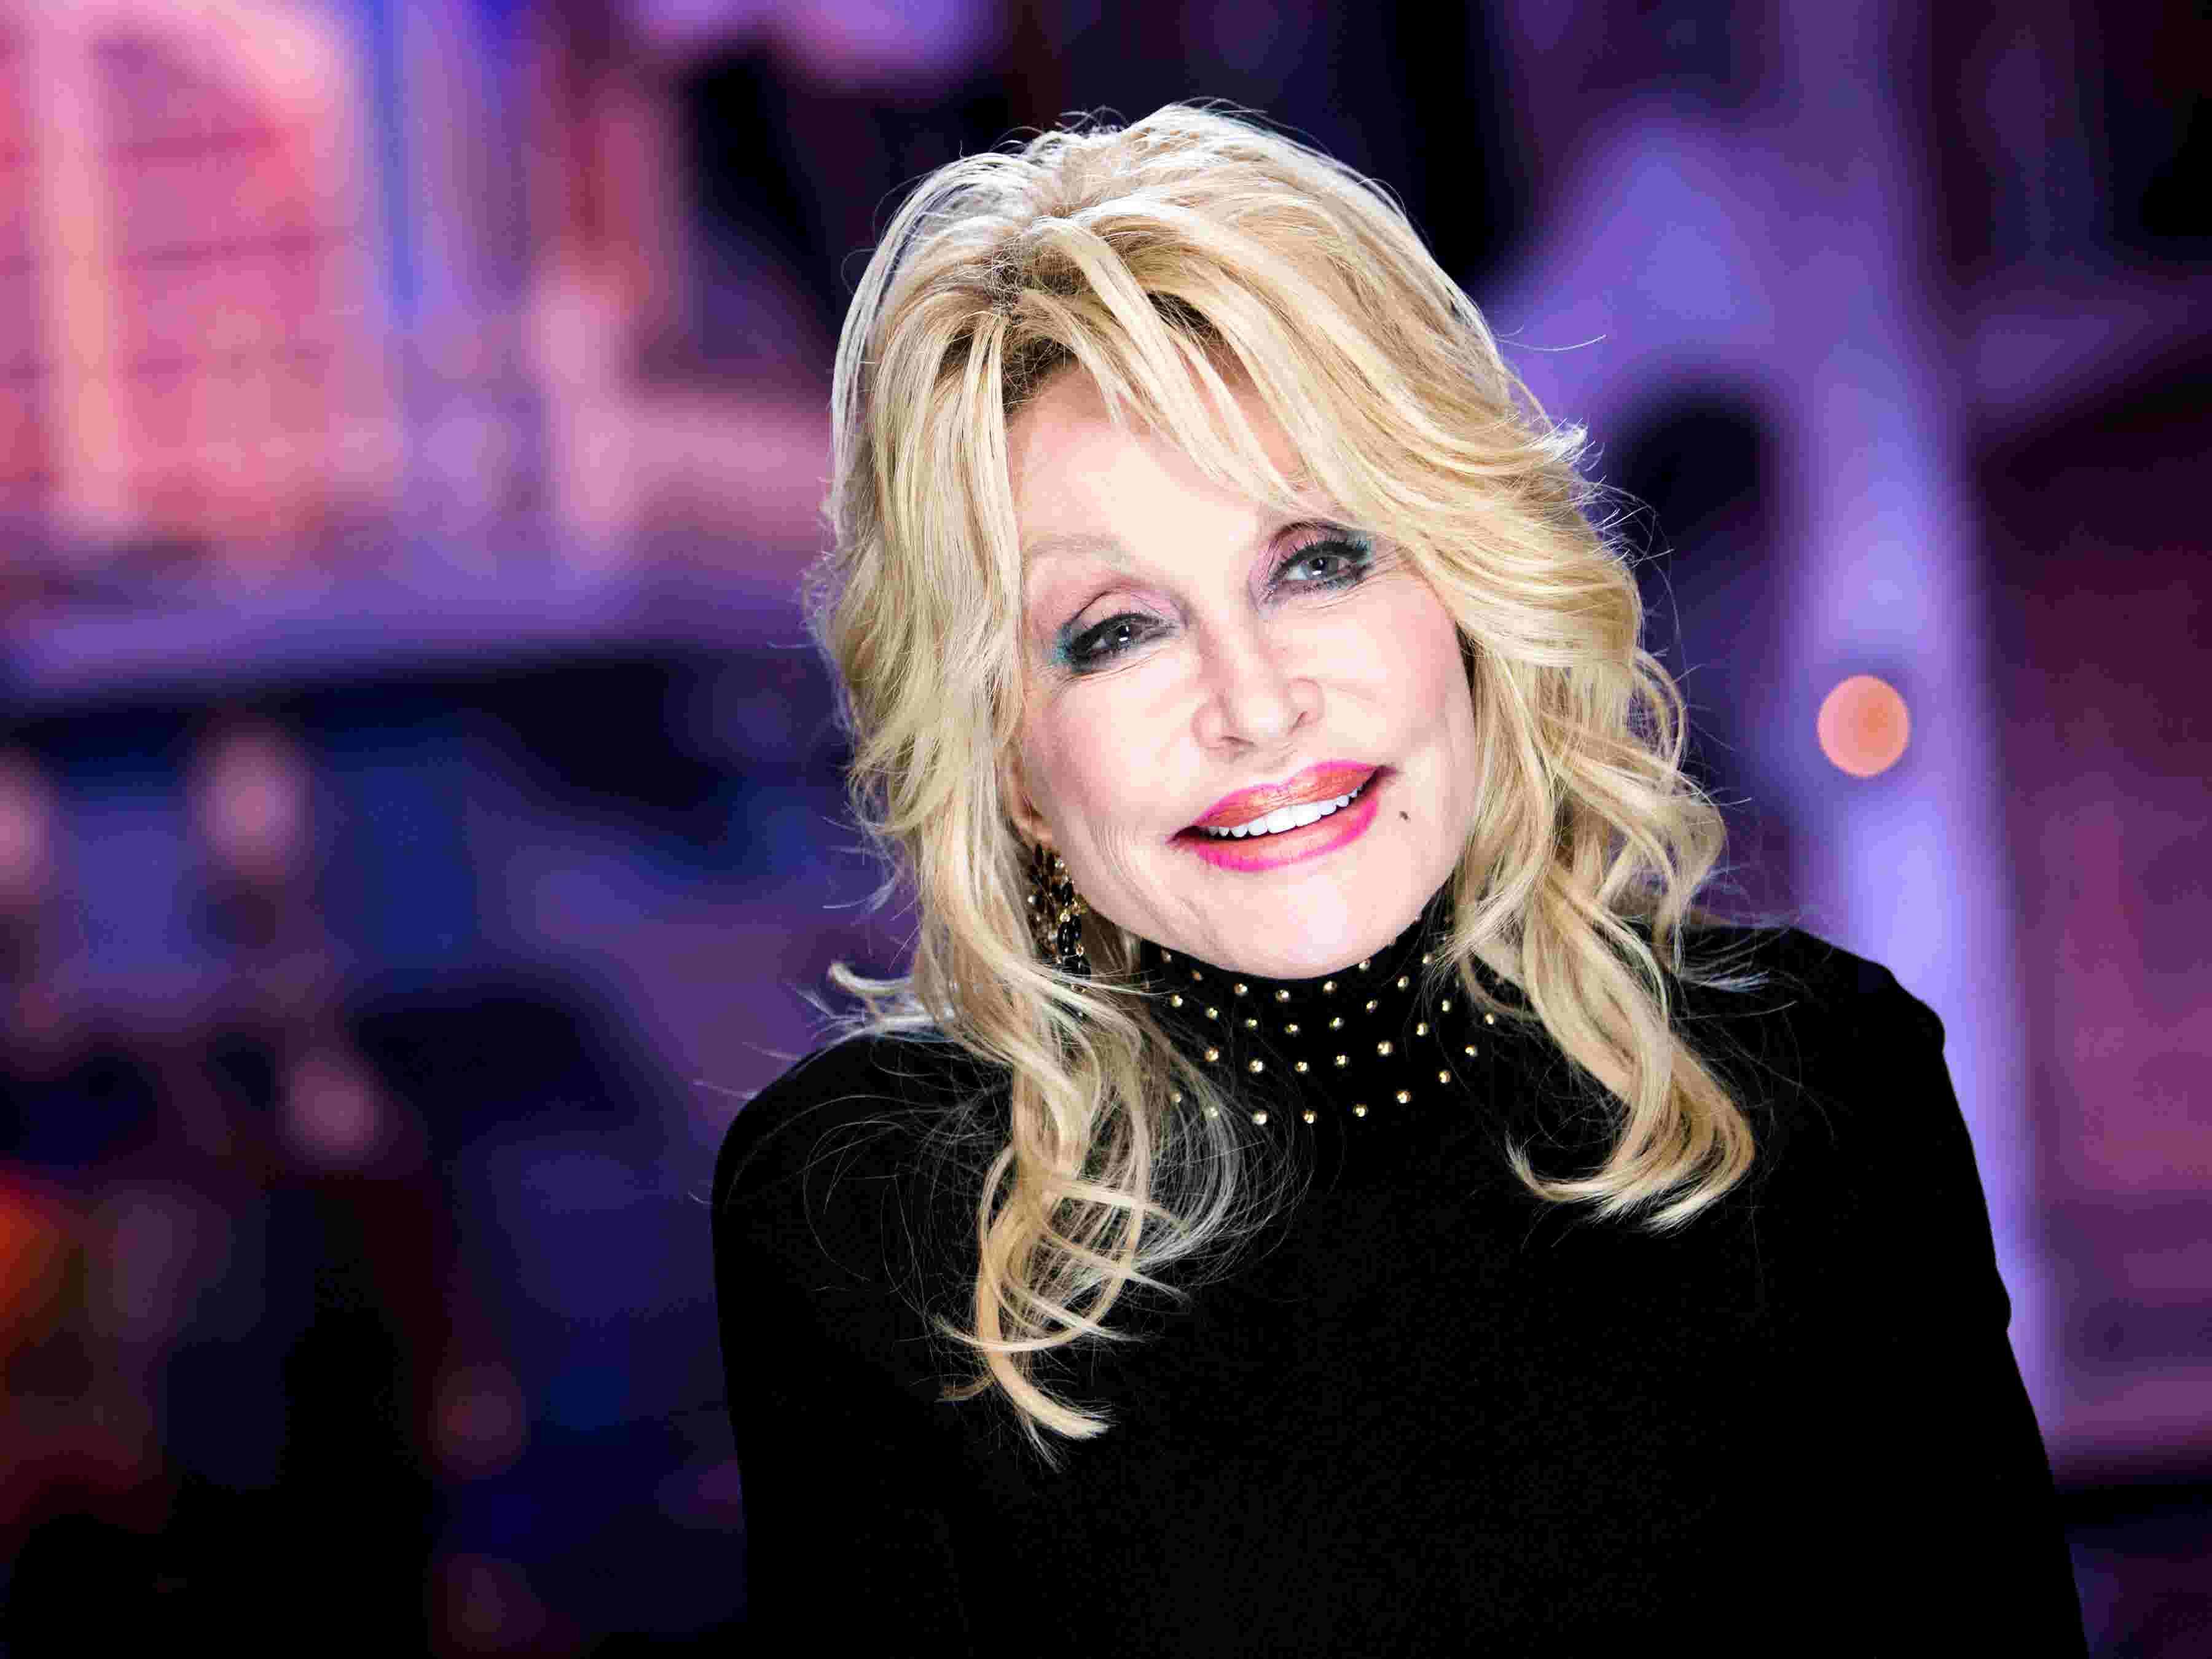 Dolly Parton to talk God, suicide, politics in new podcast, 'Dolly Parton's America'